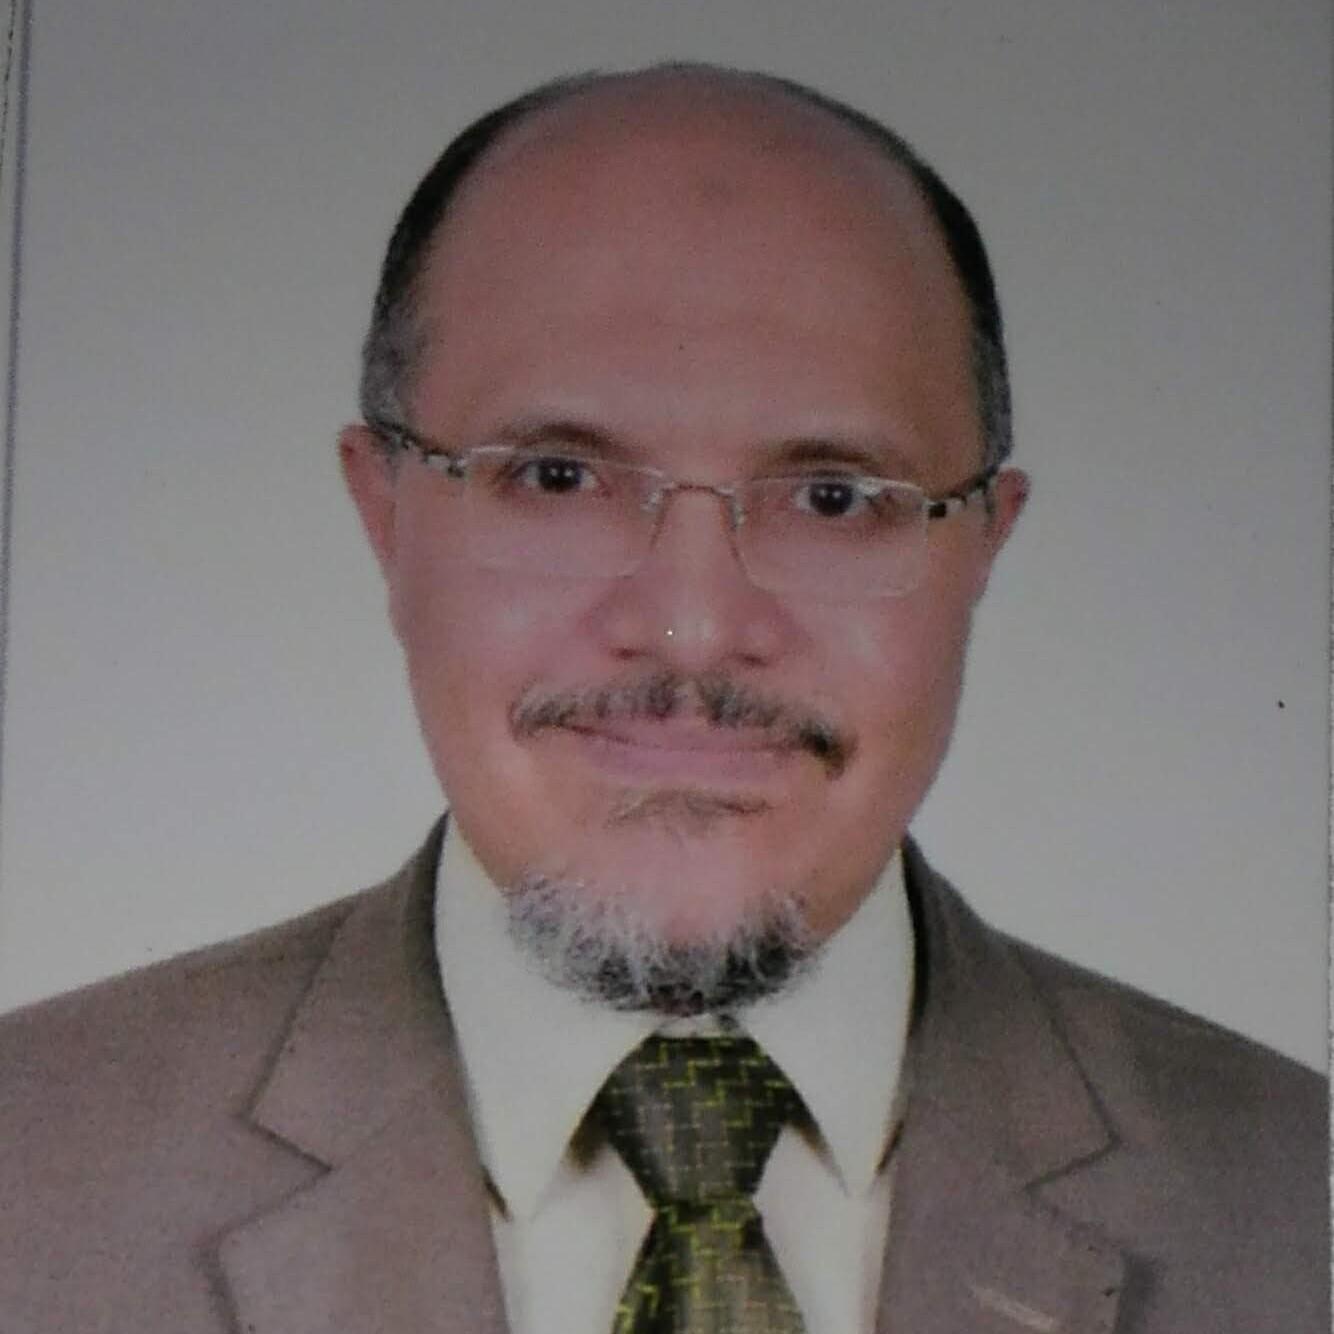 دكتور عمر يوسف حماد